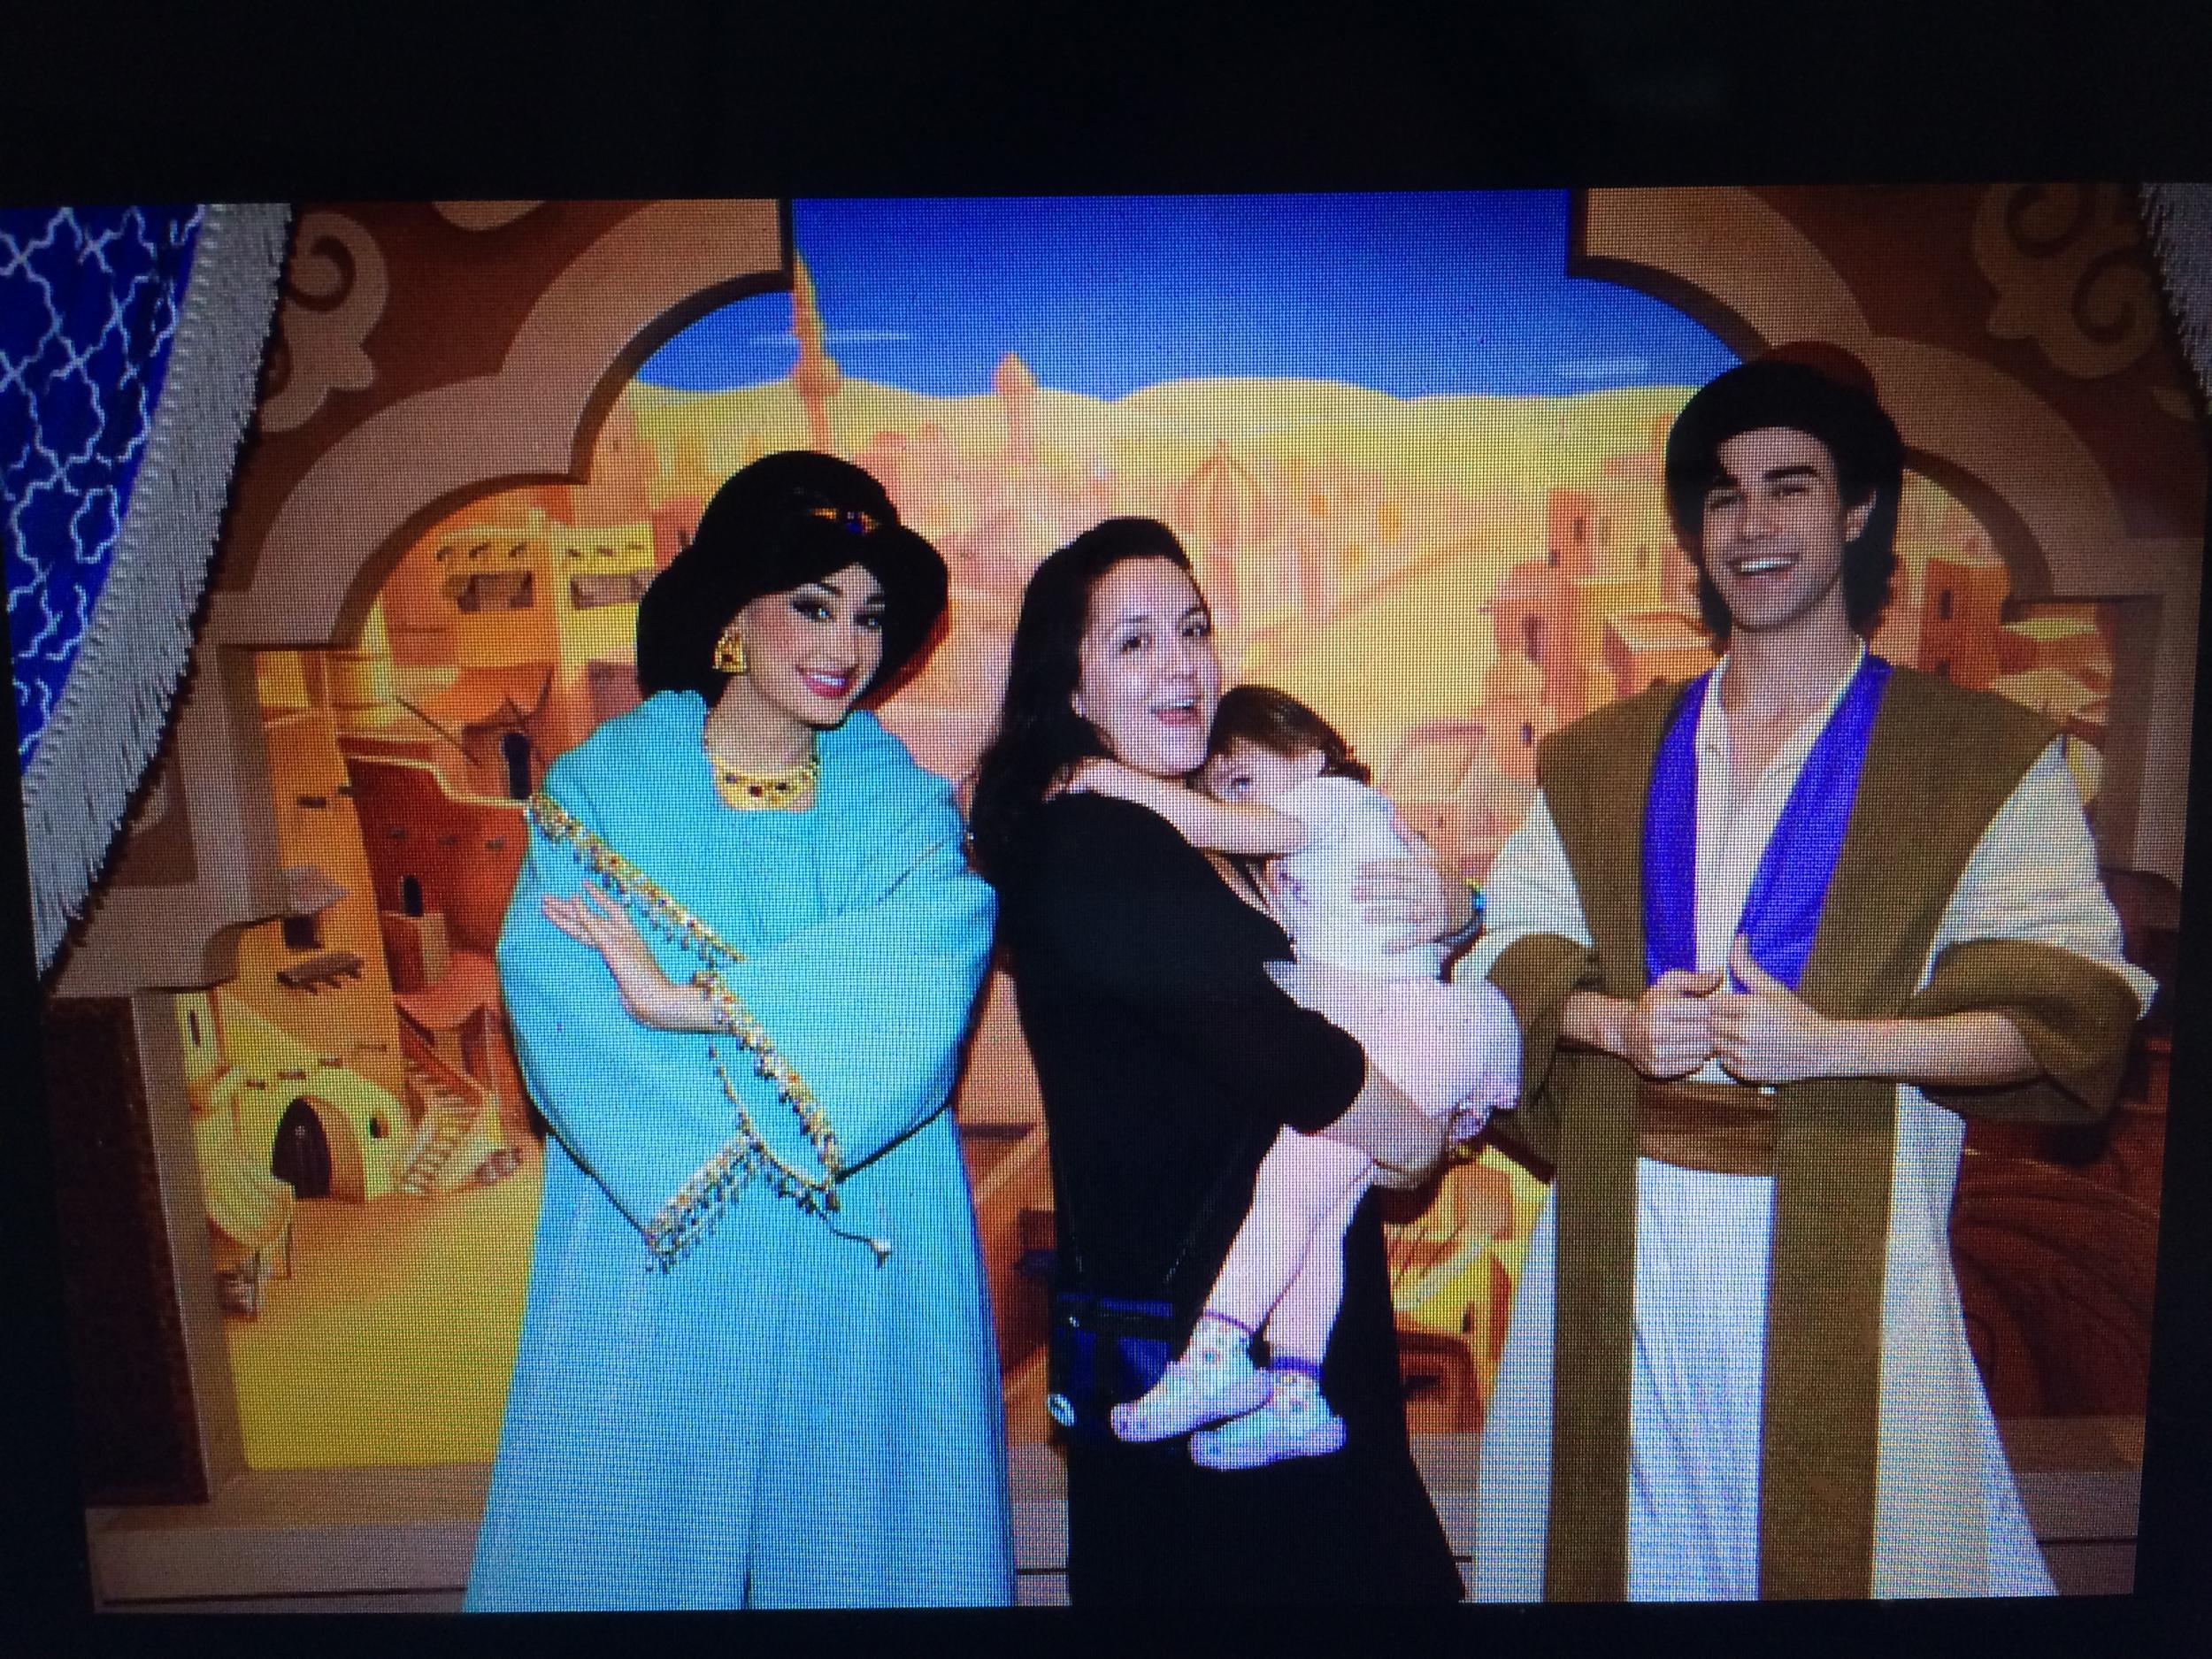 Aladdin meeting FAIL last November